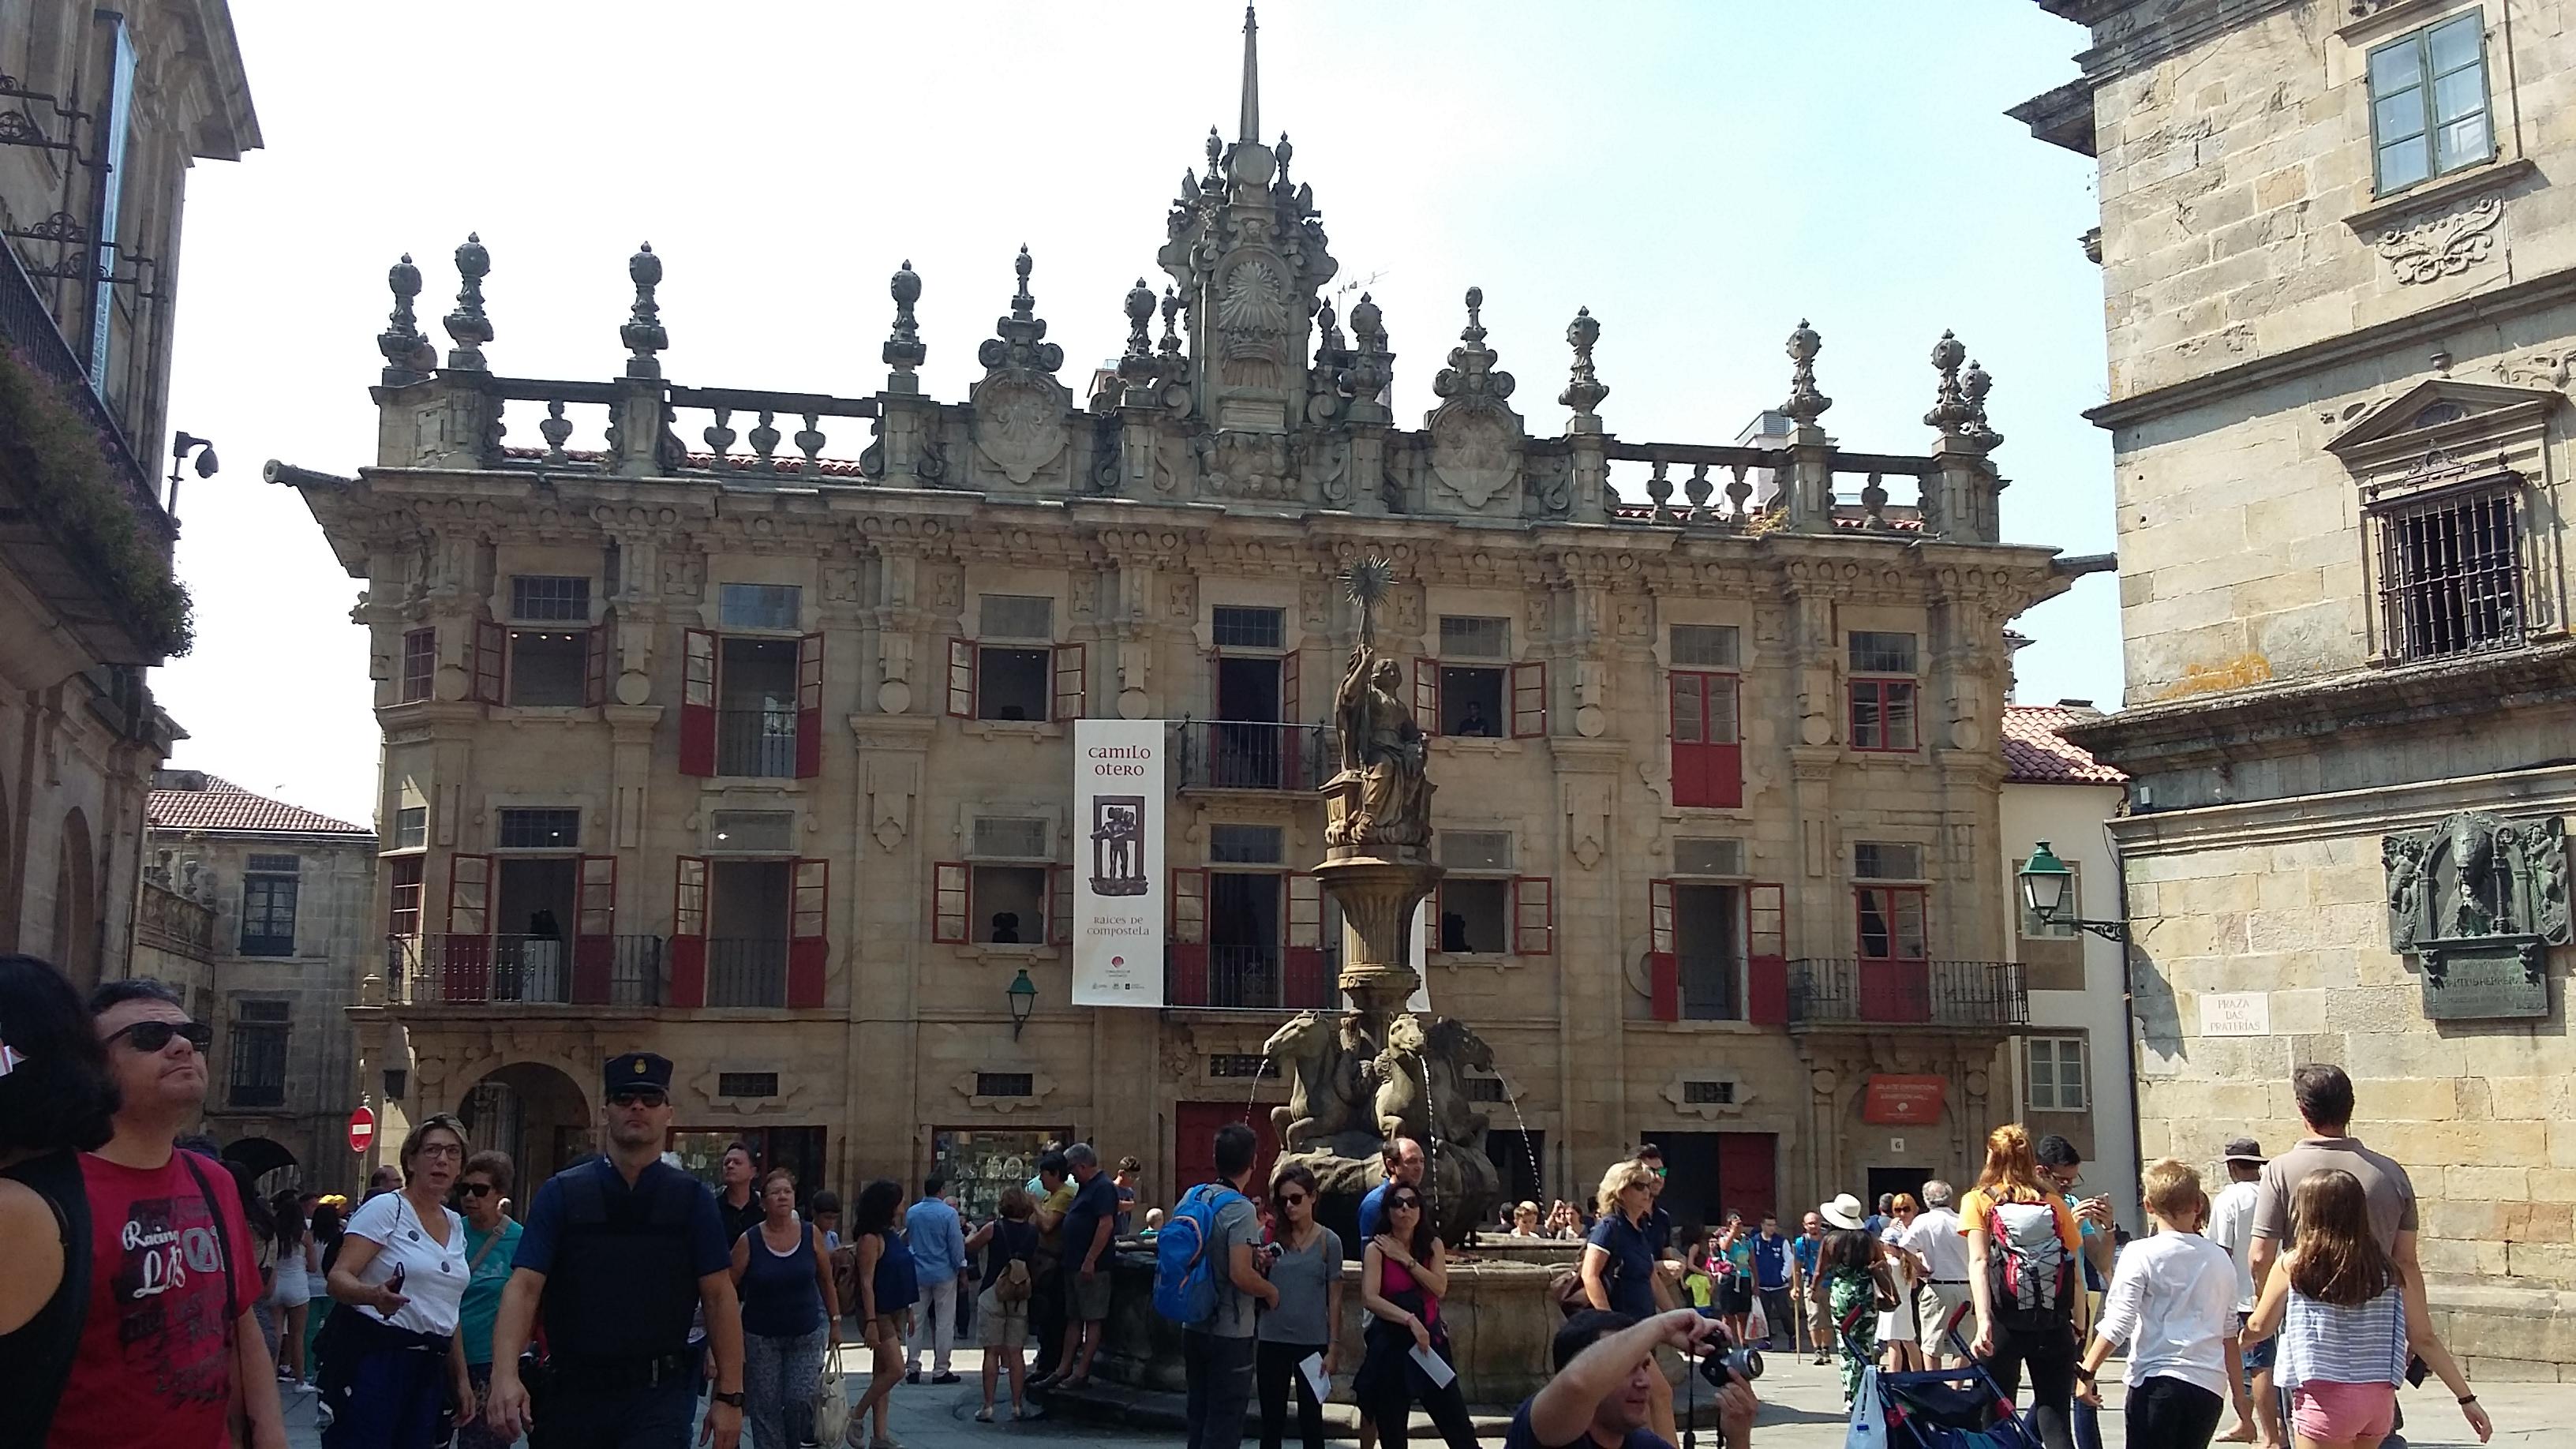 Santiago de Compostela Plaza de las Platerías